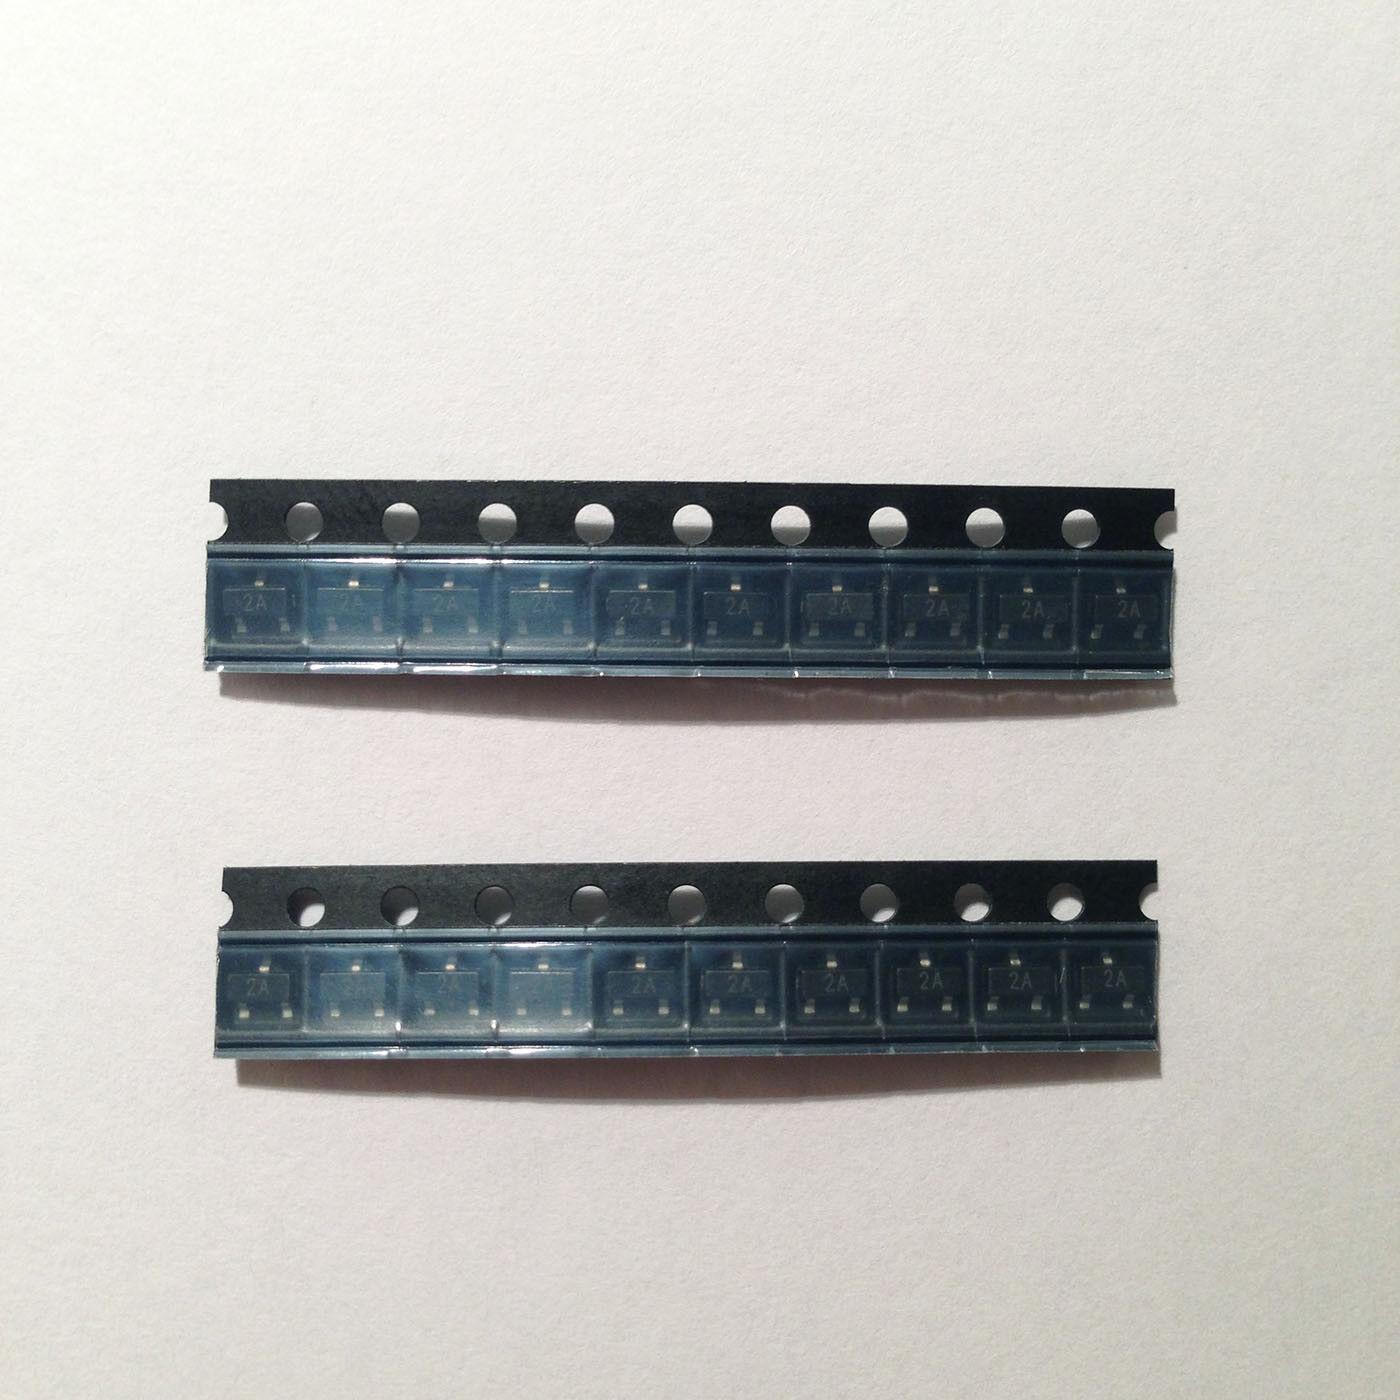 2 x bf579 silicon pnp planar RF transistor 200mw 20v 25ma siemens sot-23 2pcs